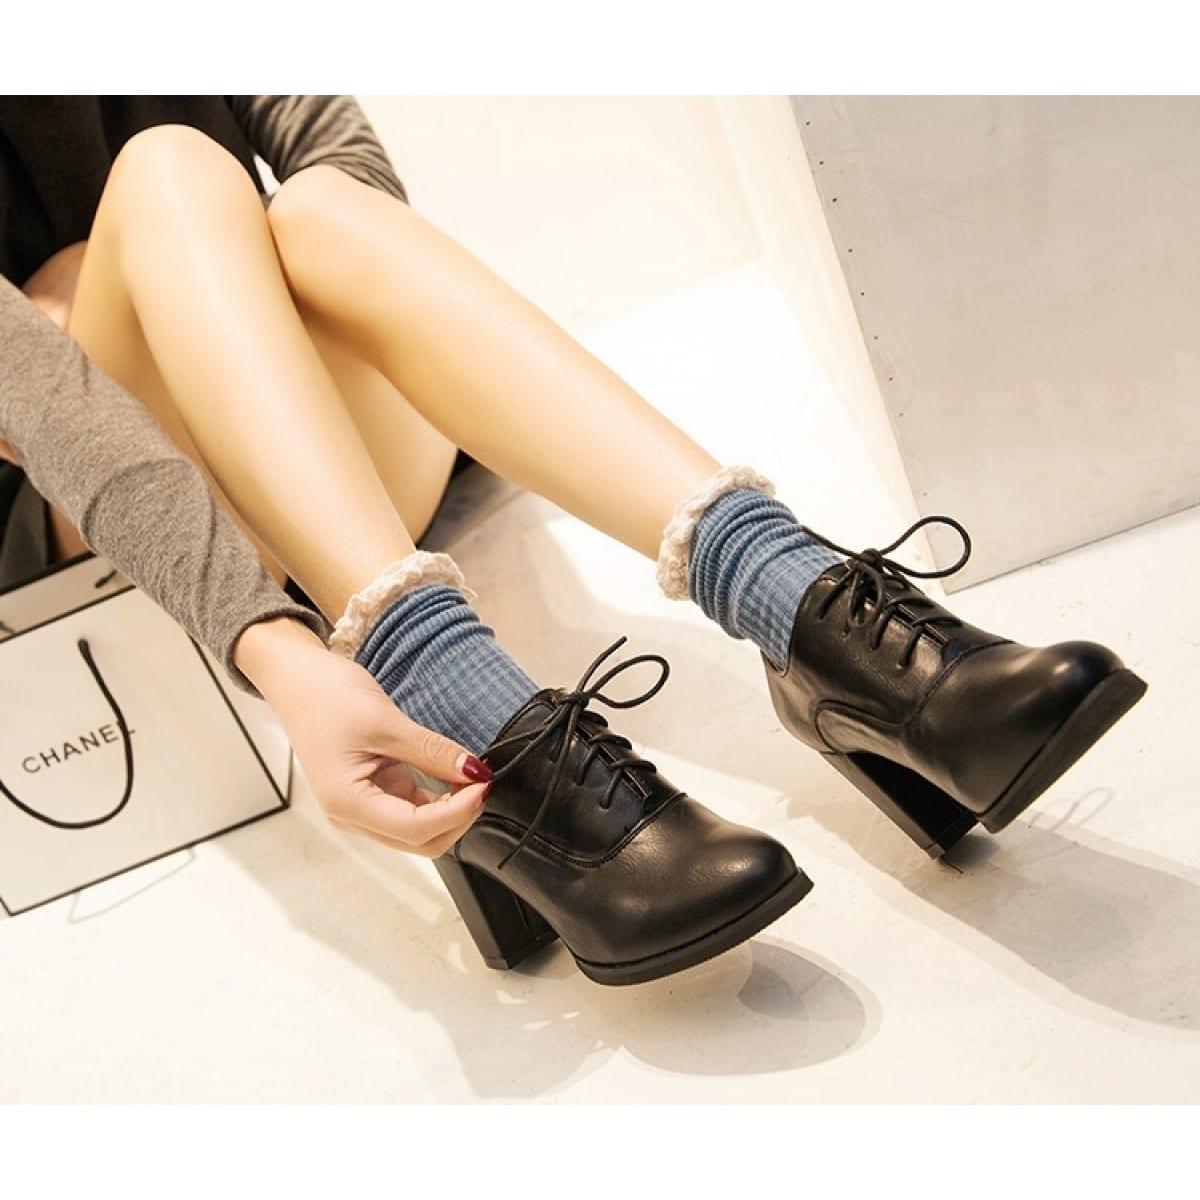 Trendy women's shoe brands right now